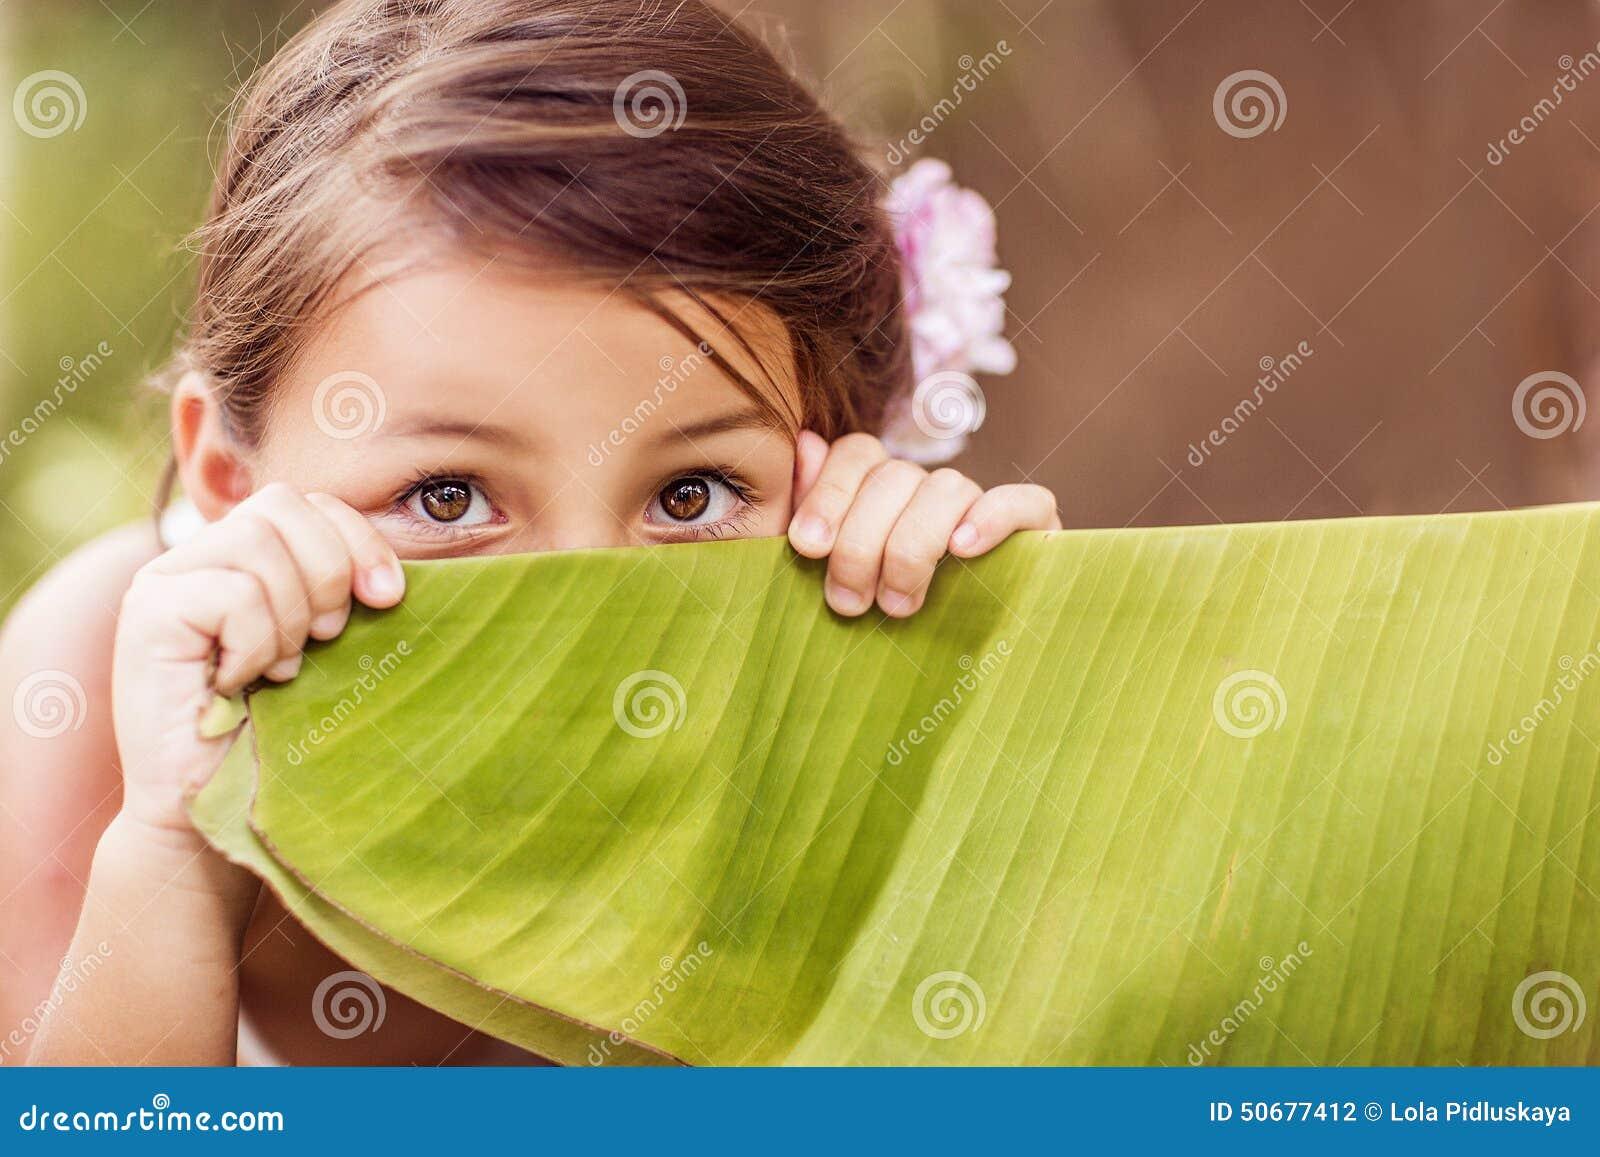 Download 少许隐藏的女孩 库存照片. 图片 包括有 眼睛, 叶子, 海岛, 比赛, 注视, 楼梯栏杆, beautifuler - 50677412